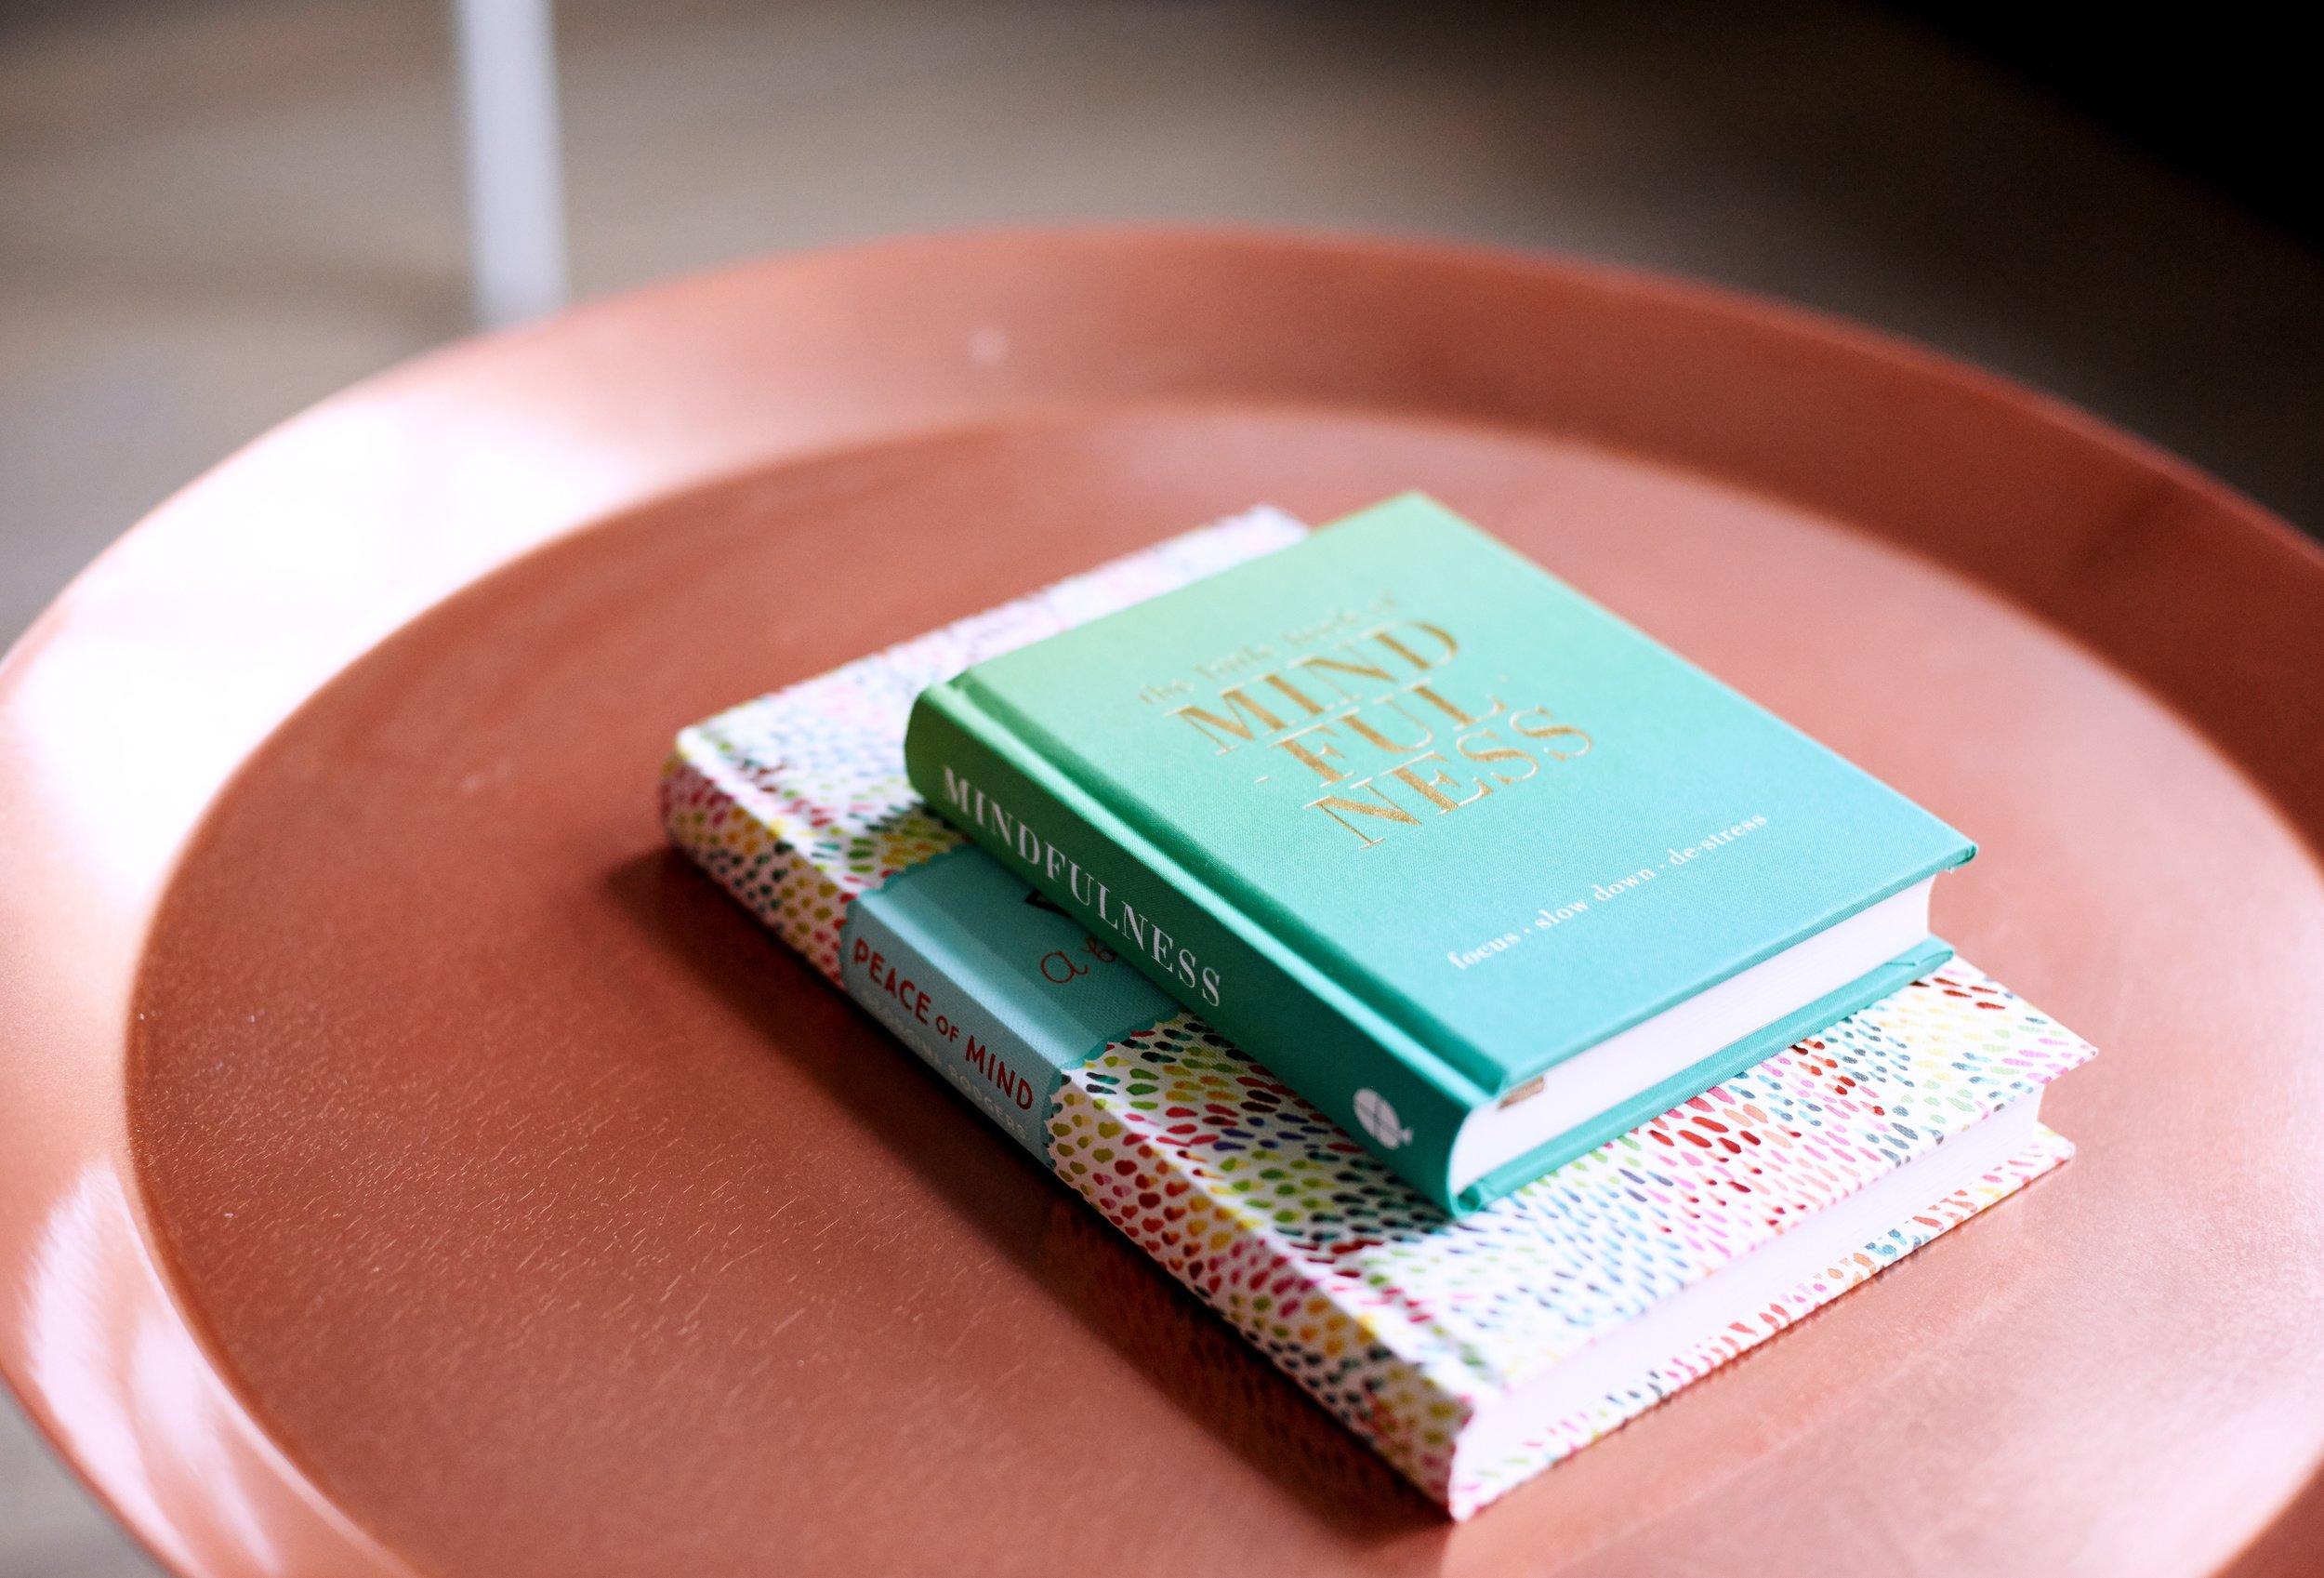 mindfullness book, self compassion